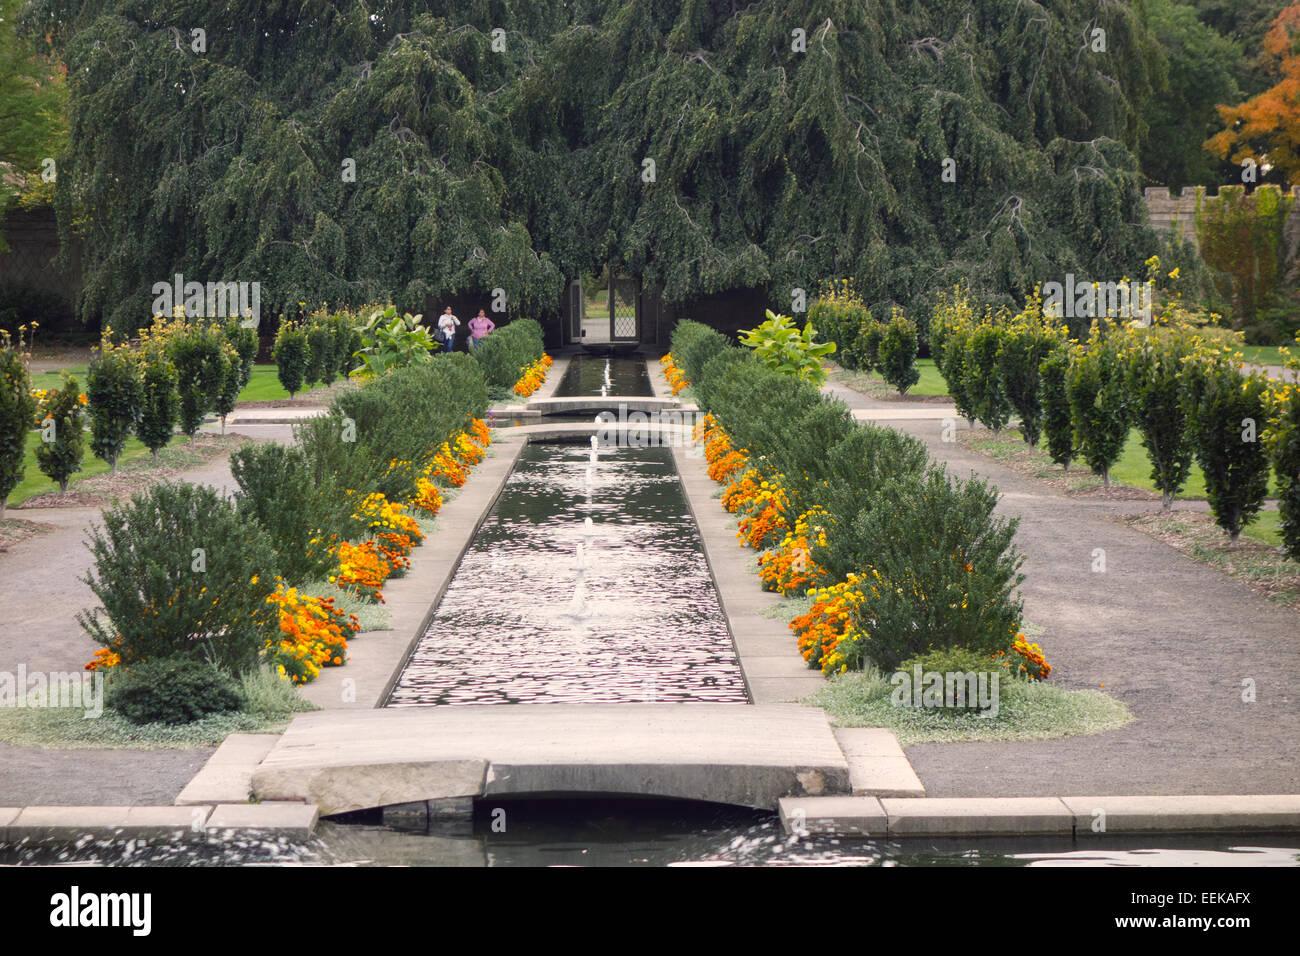 Untermyer Gardens Conservancy In Yonkers Ny Stock Photo 77872030